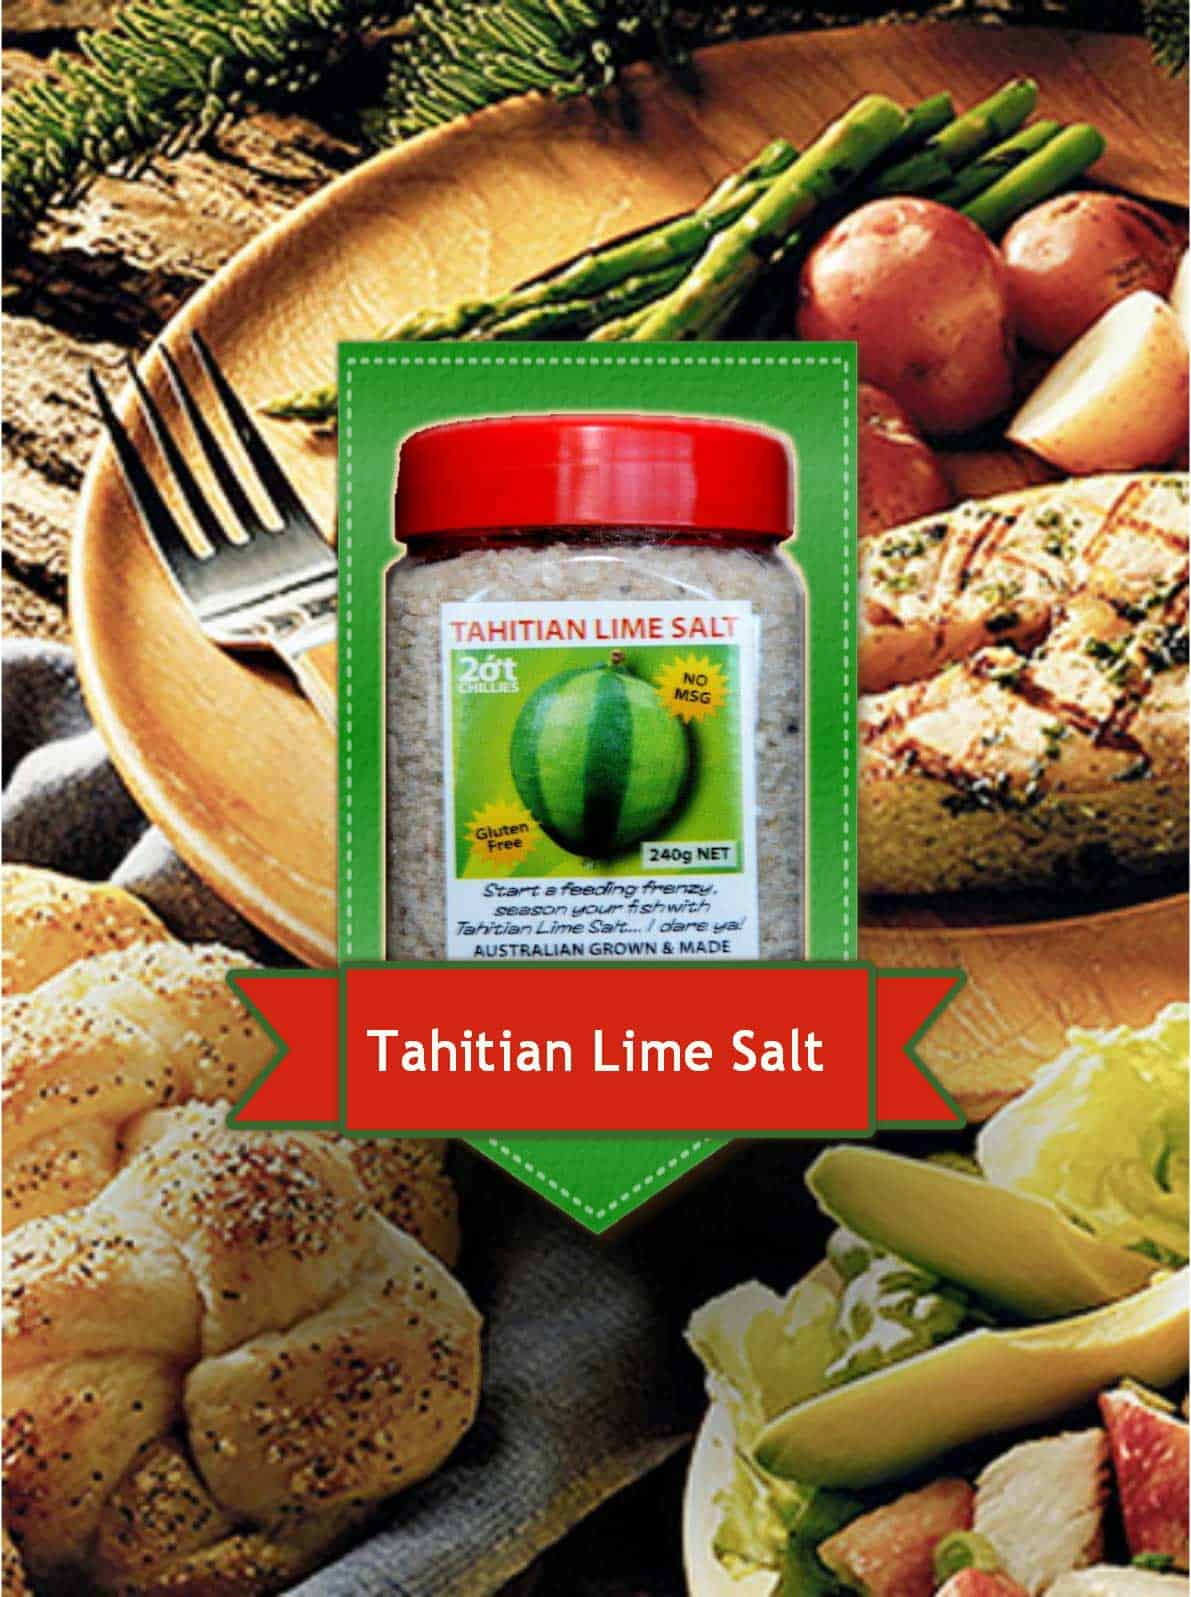 2ot-Chillies-Lip-Smackin-Salts